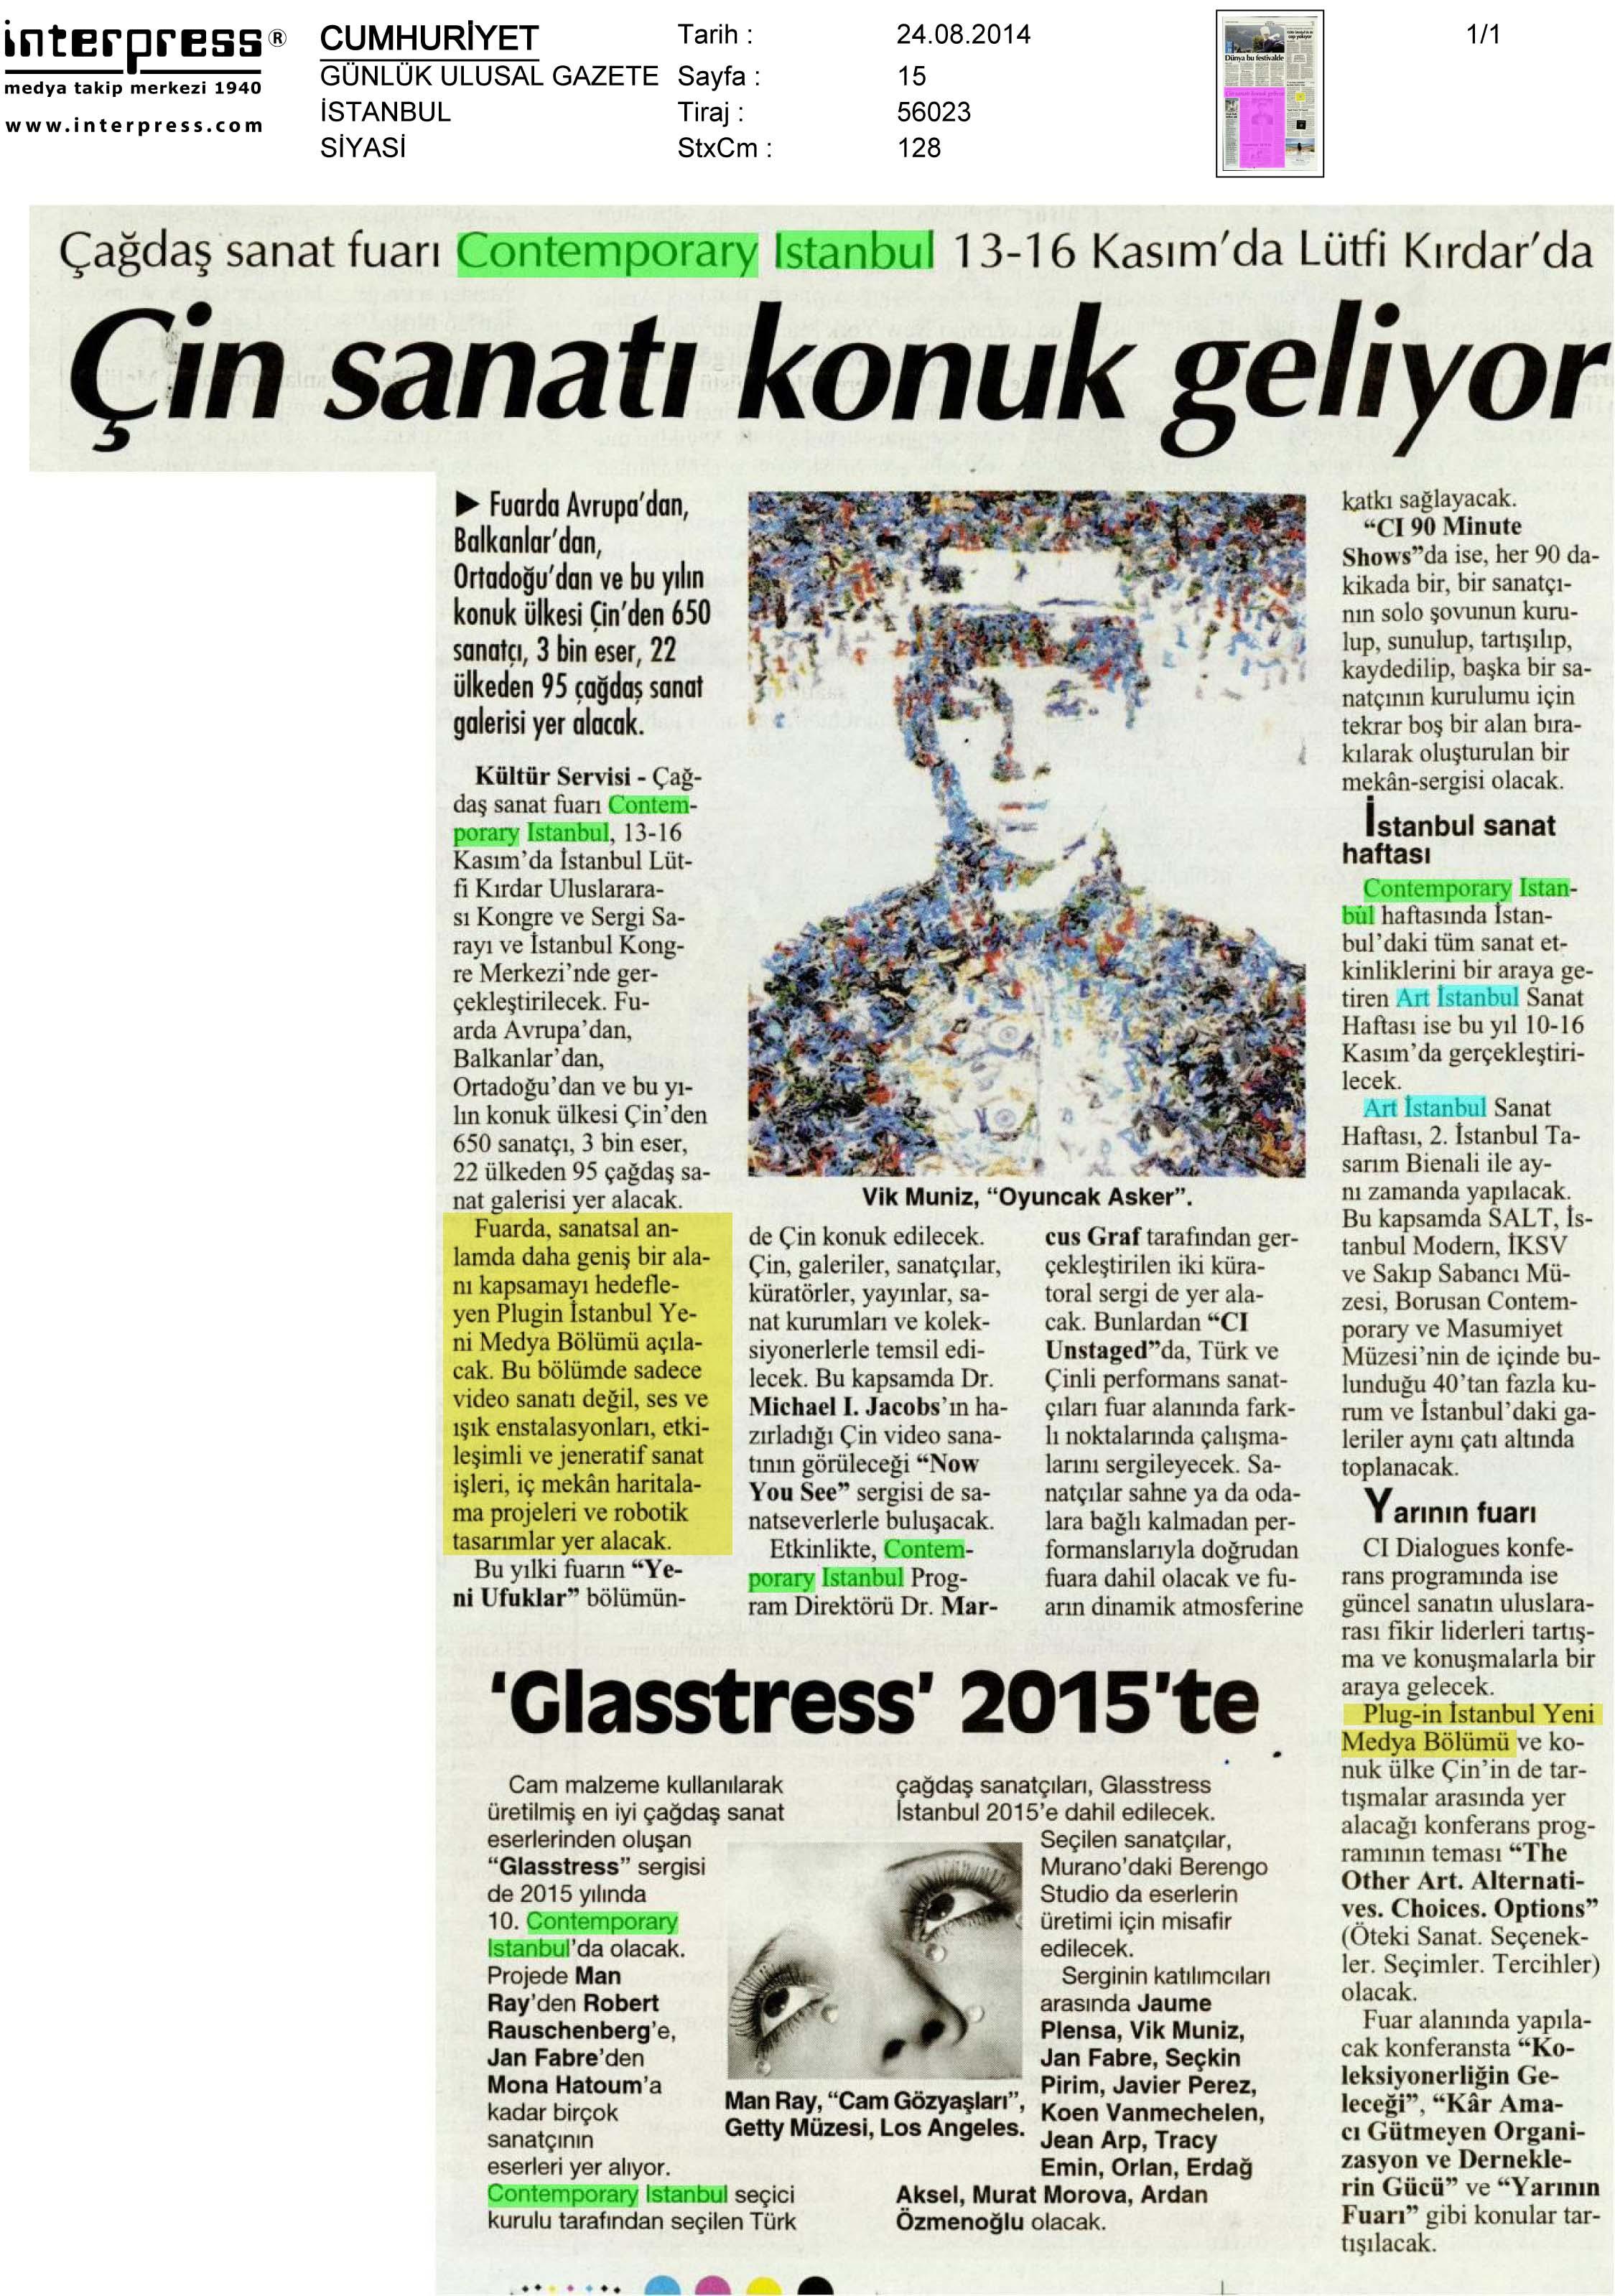 Cumhuriyet - Günlük Ulusal Gazete 24-08.jpg